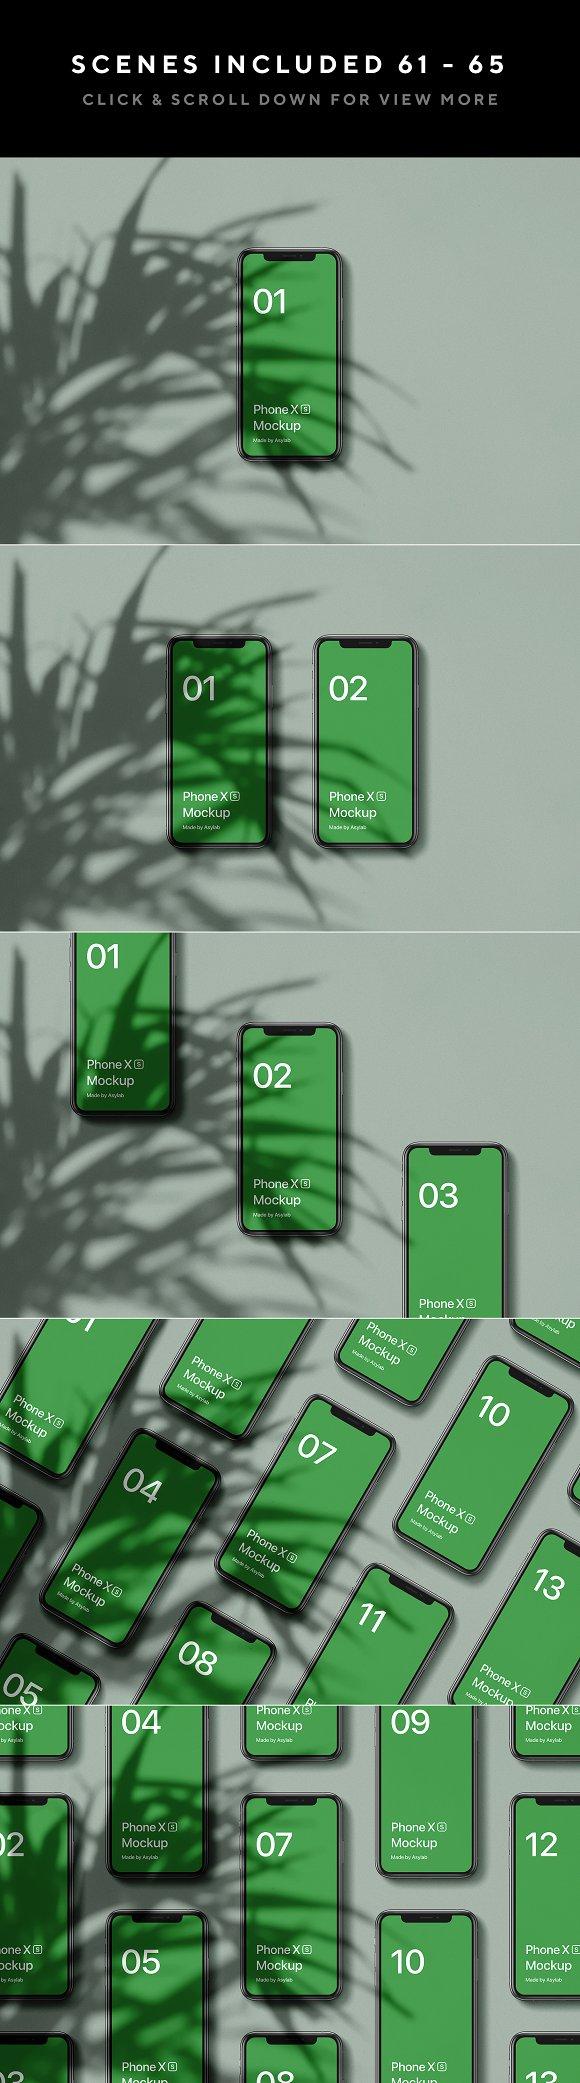 100 Branding Stationery Mockups in Branding Mockups - product preview 33